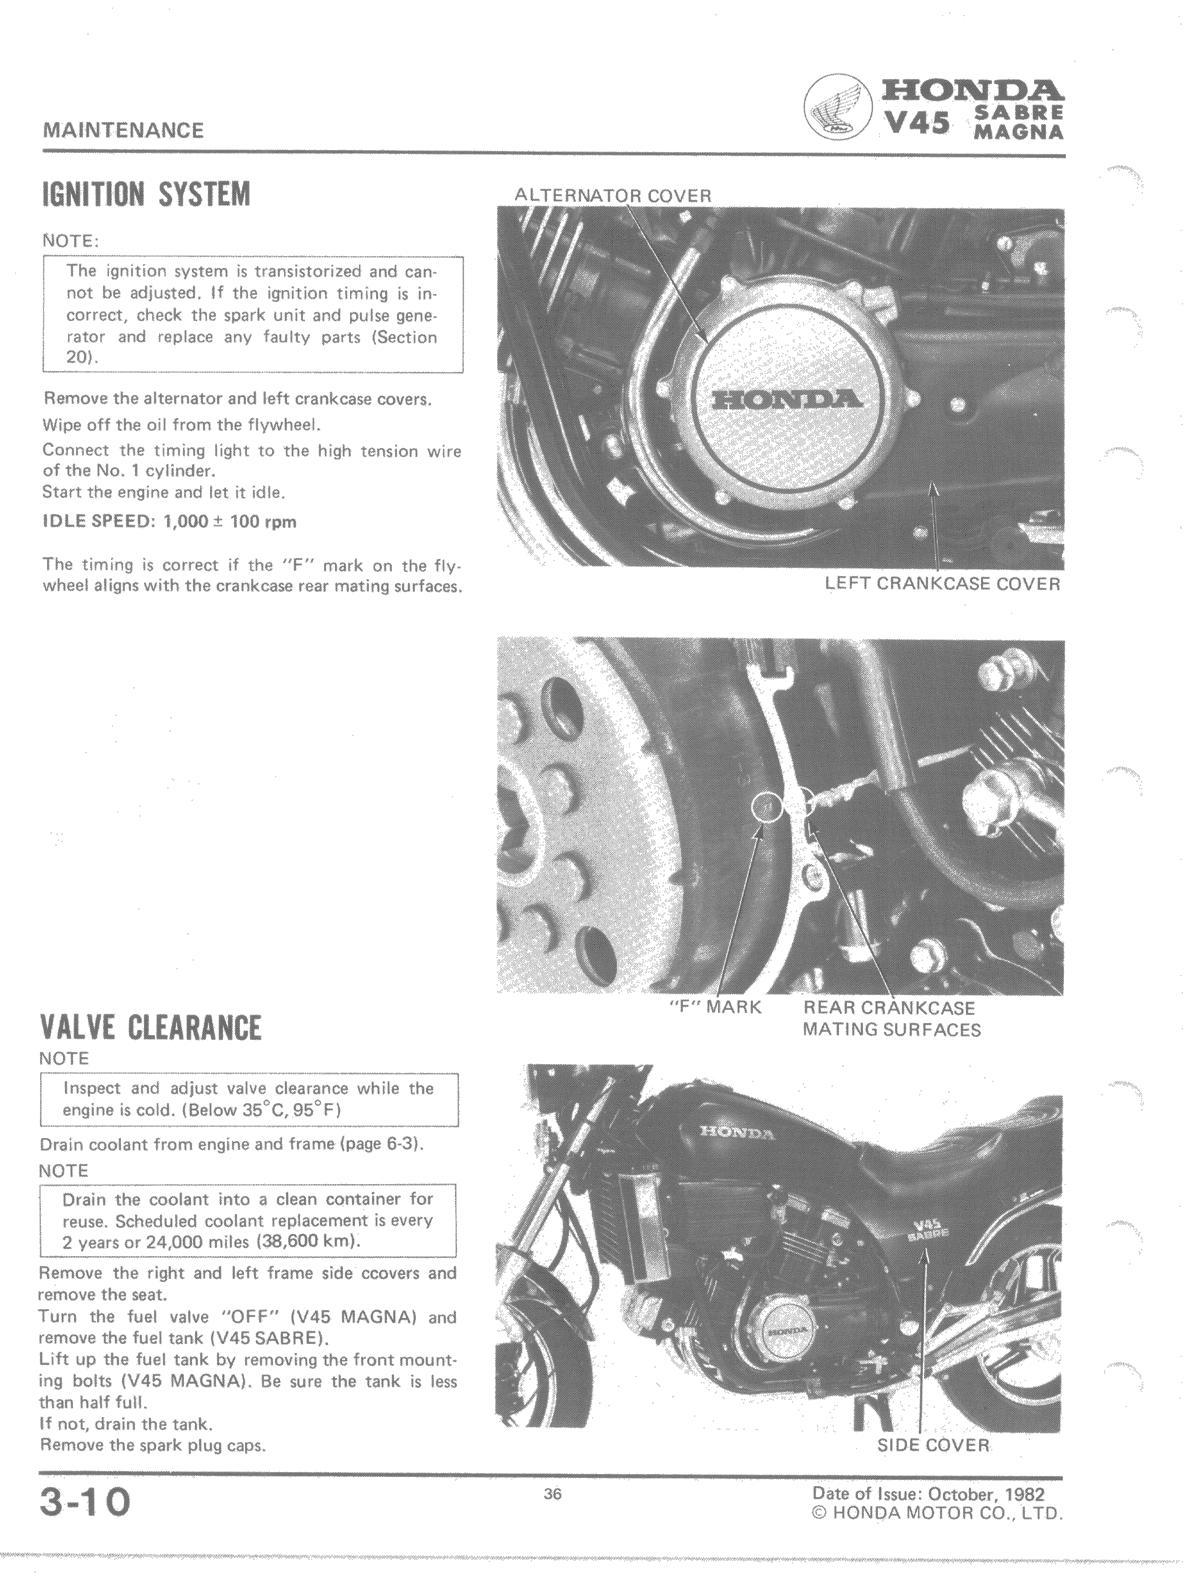 honda 350 fourtrax wiring diagram bass end ackwards    honda    v45 ignition valve clearance  bass end ackwards    honda    v45 ignition valve clearance